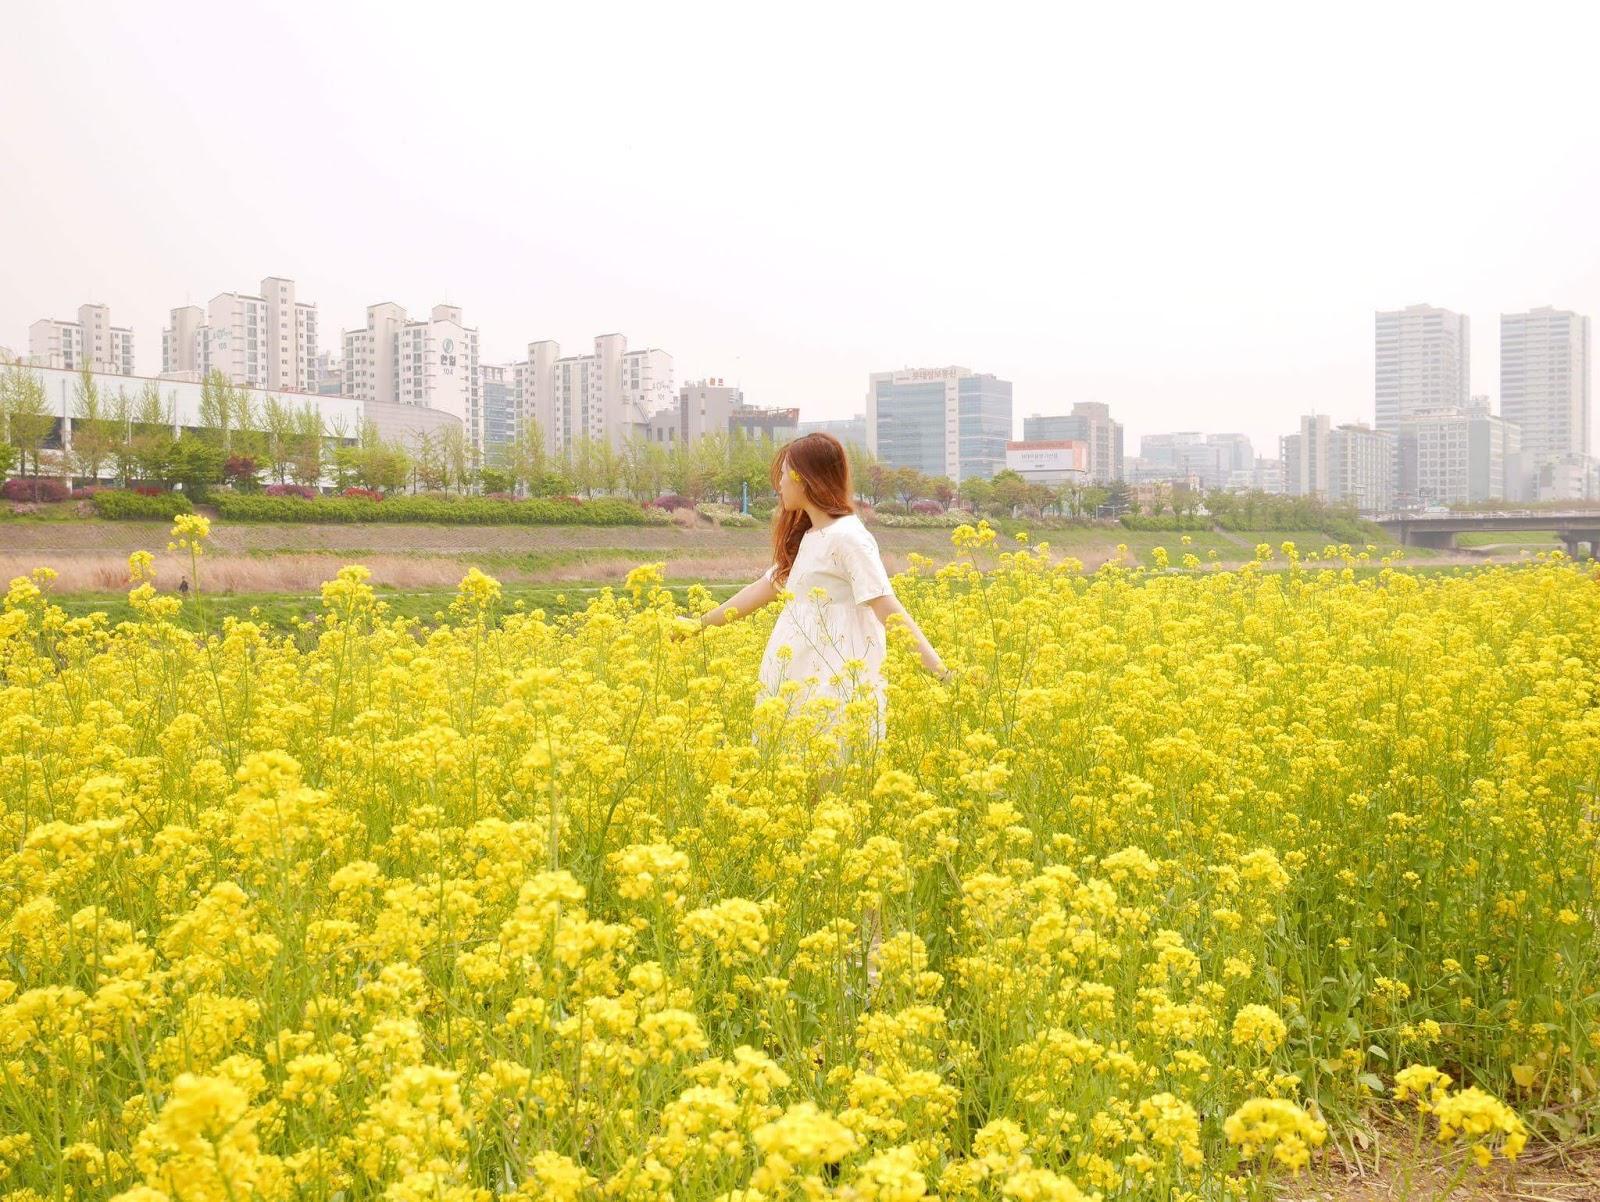 EAT.TRAVEL.REPEAT: [KOREA] CANOLA FIELD, GURO